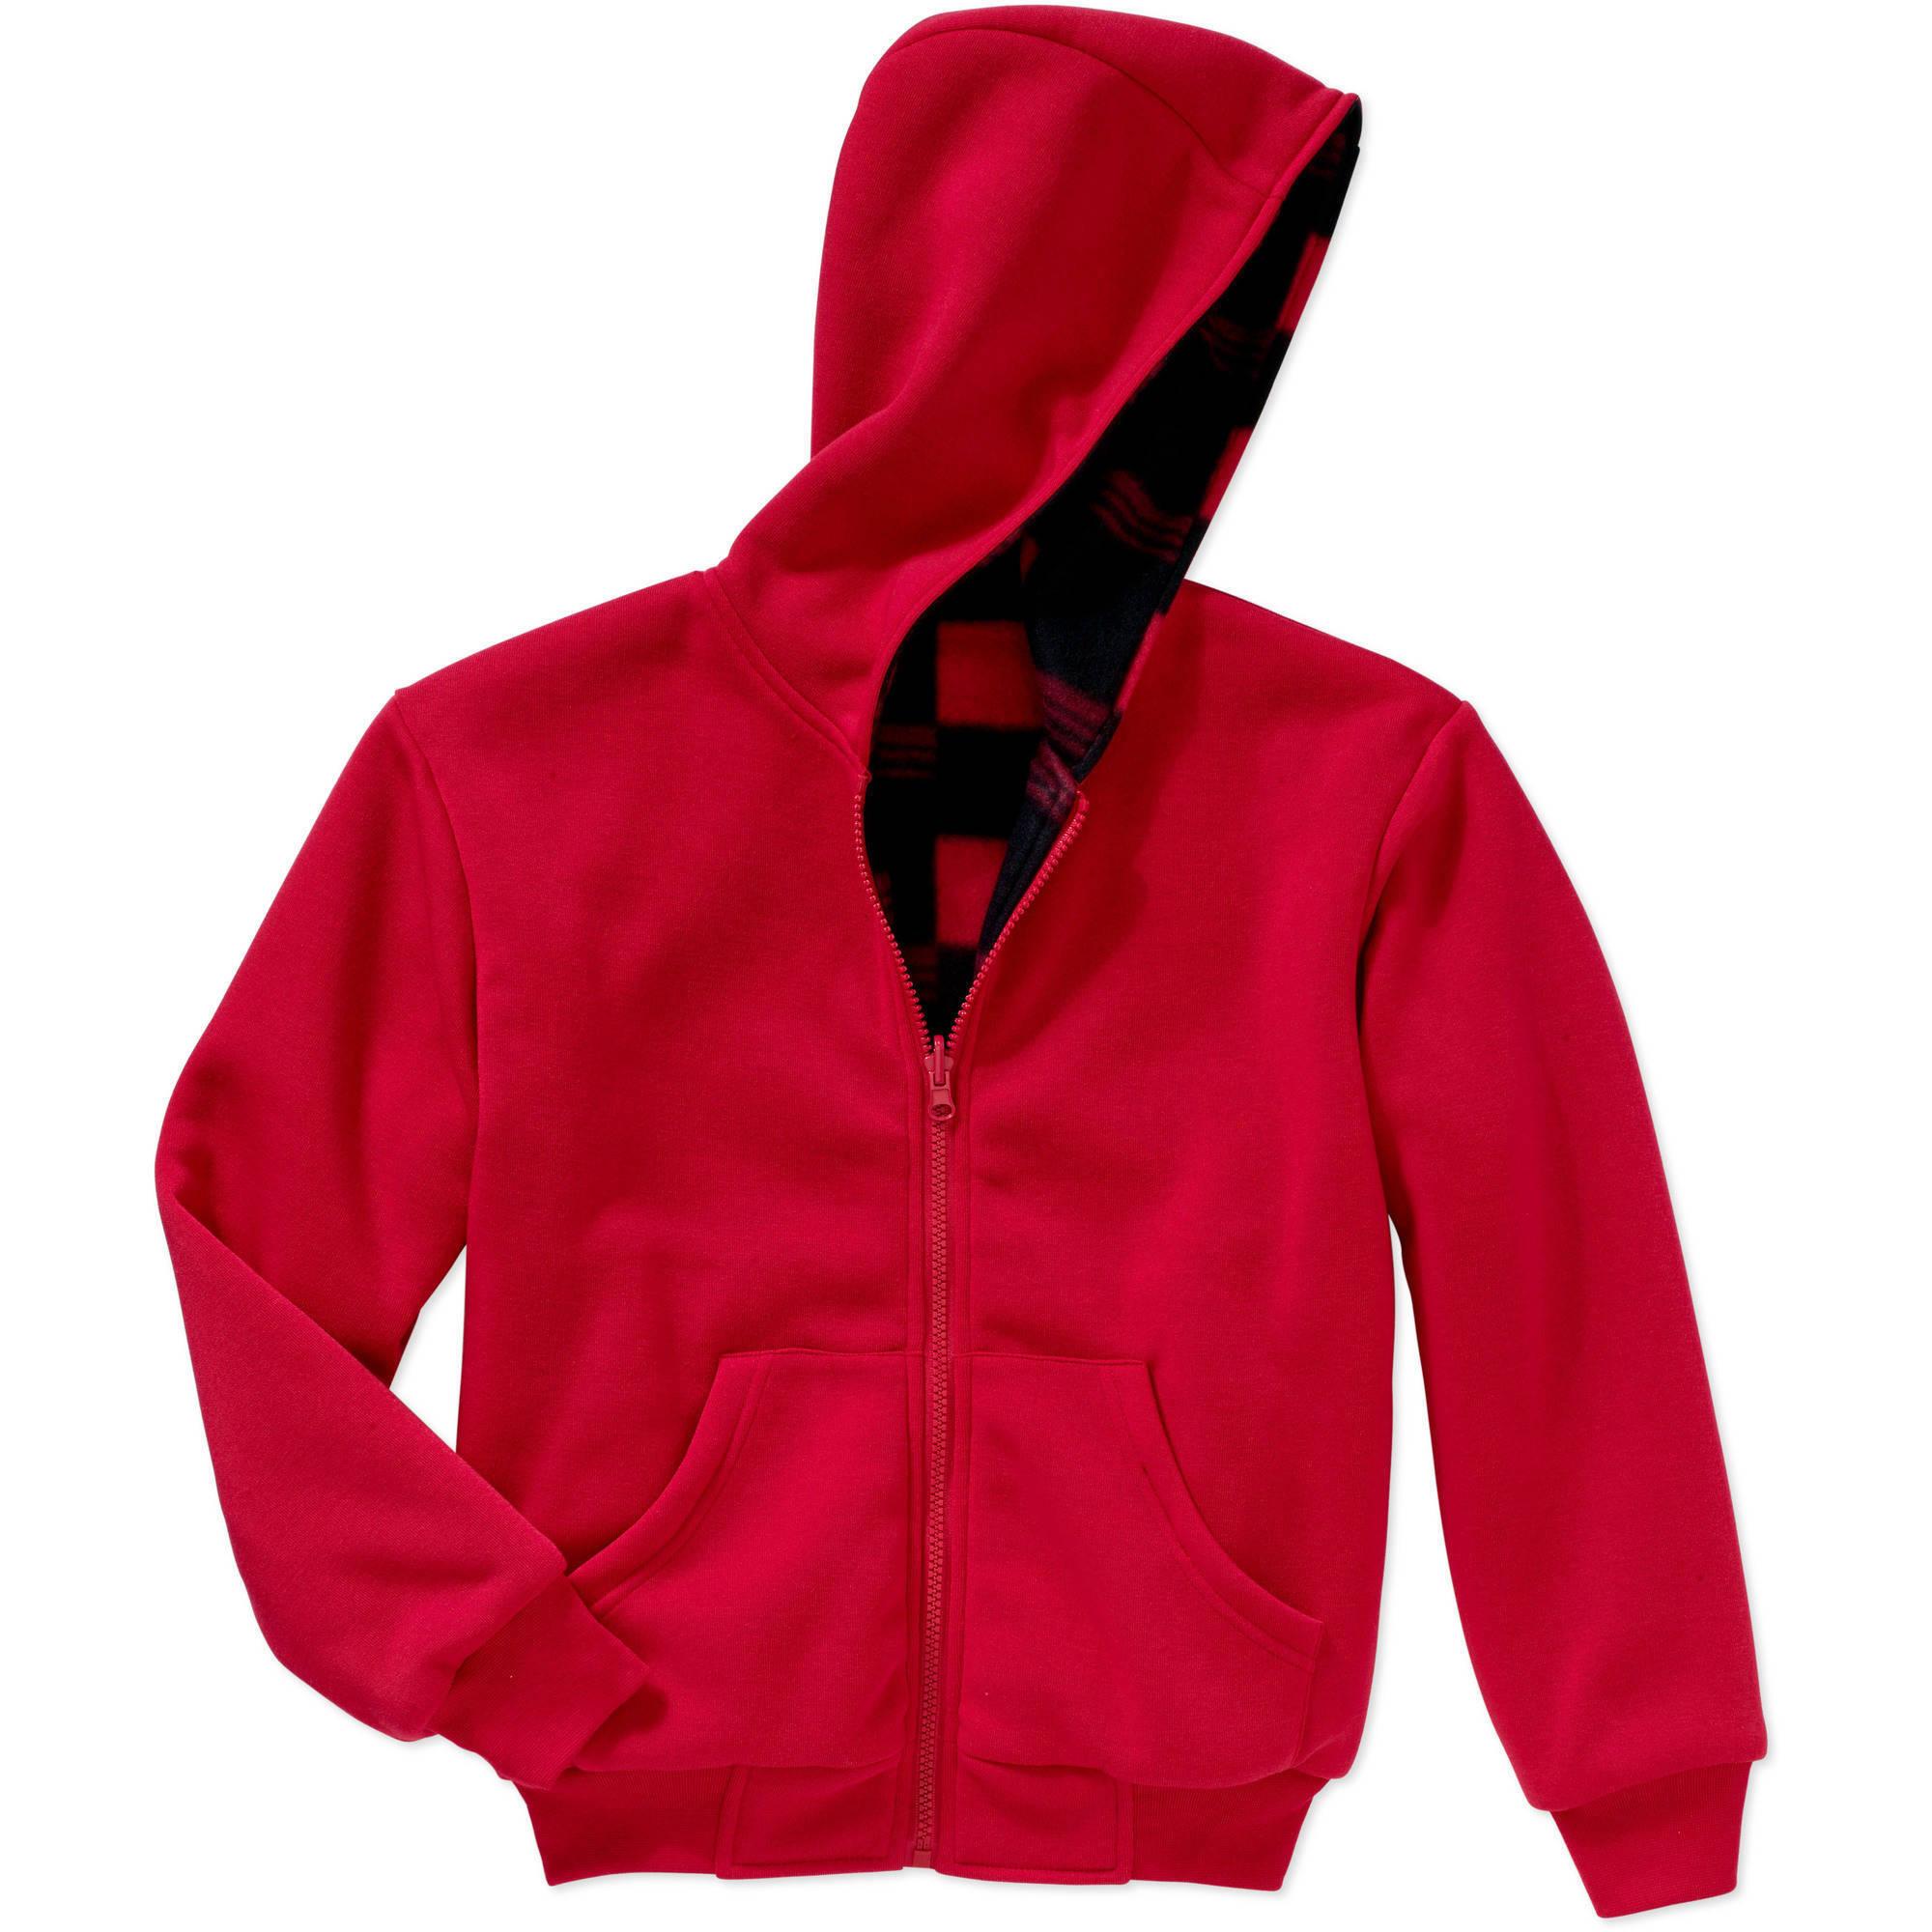 BOCINI Boys Reversible Fleece Hooded Jacket, Available in Buffalo and Camo Prints